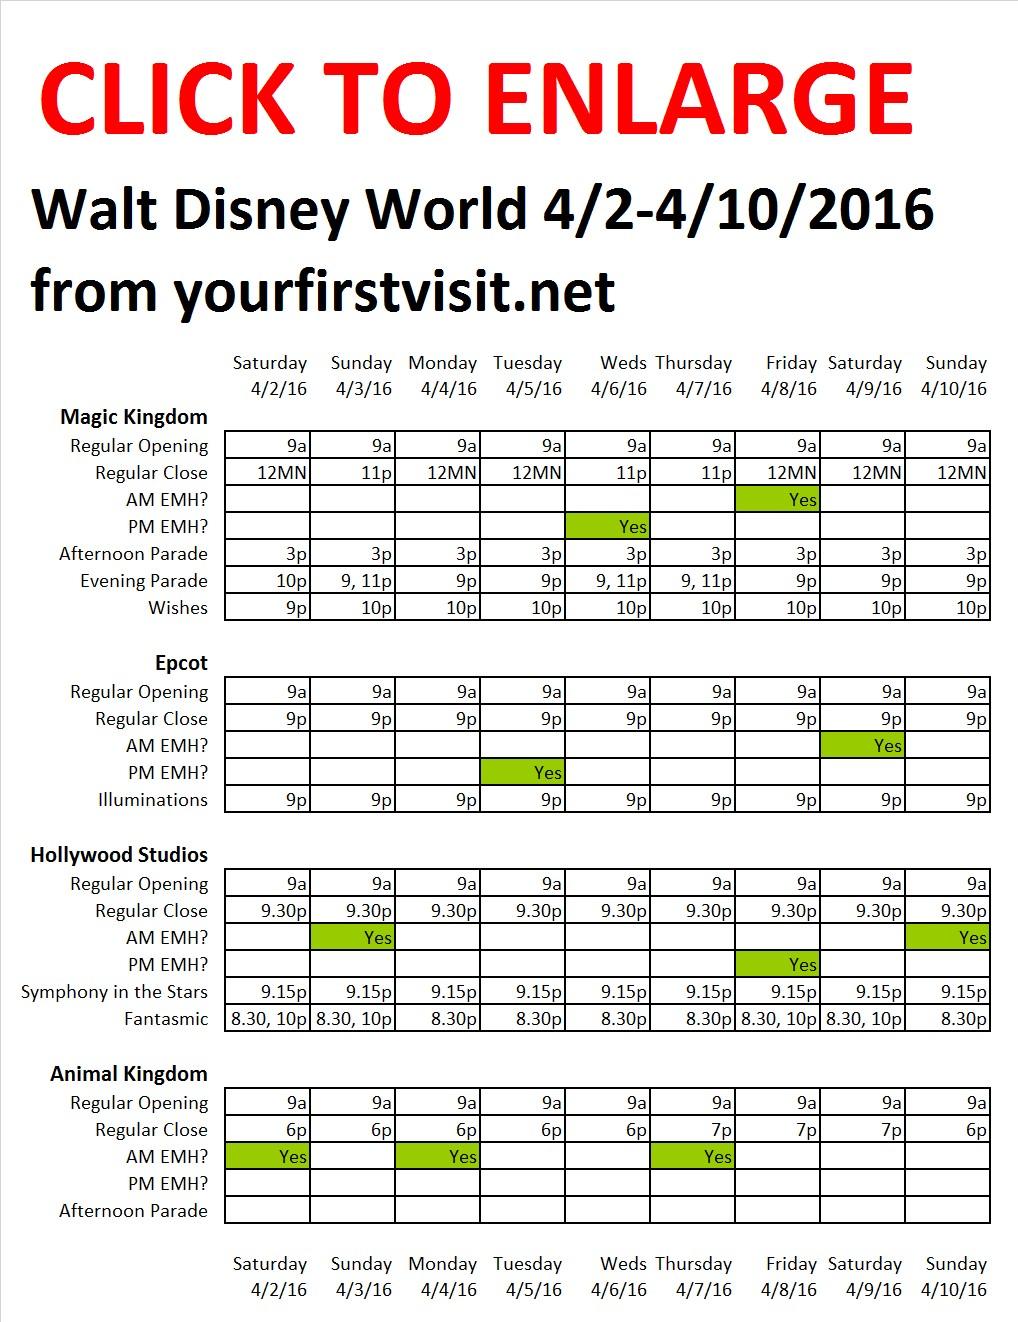 Disney World 4-2 to 4-10-2016 from yourfirstvisit.net